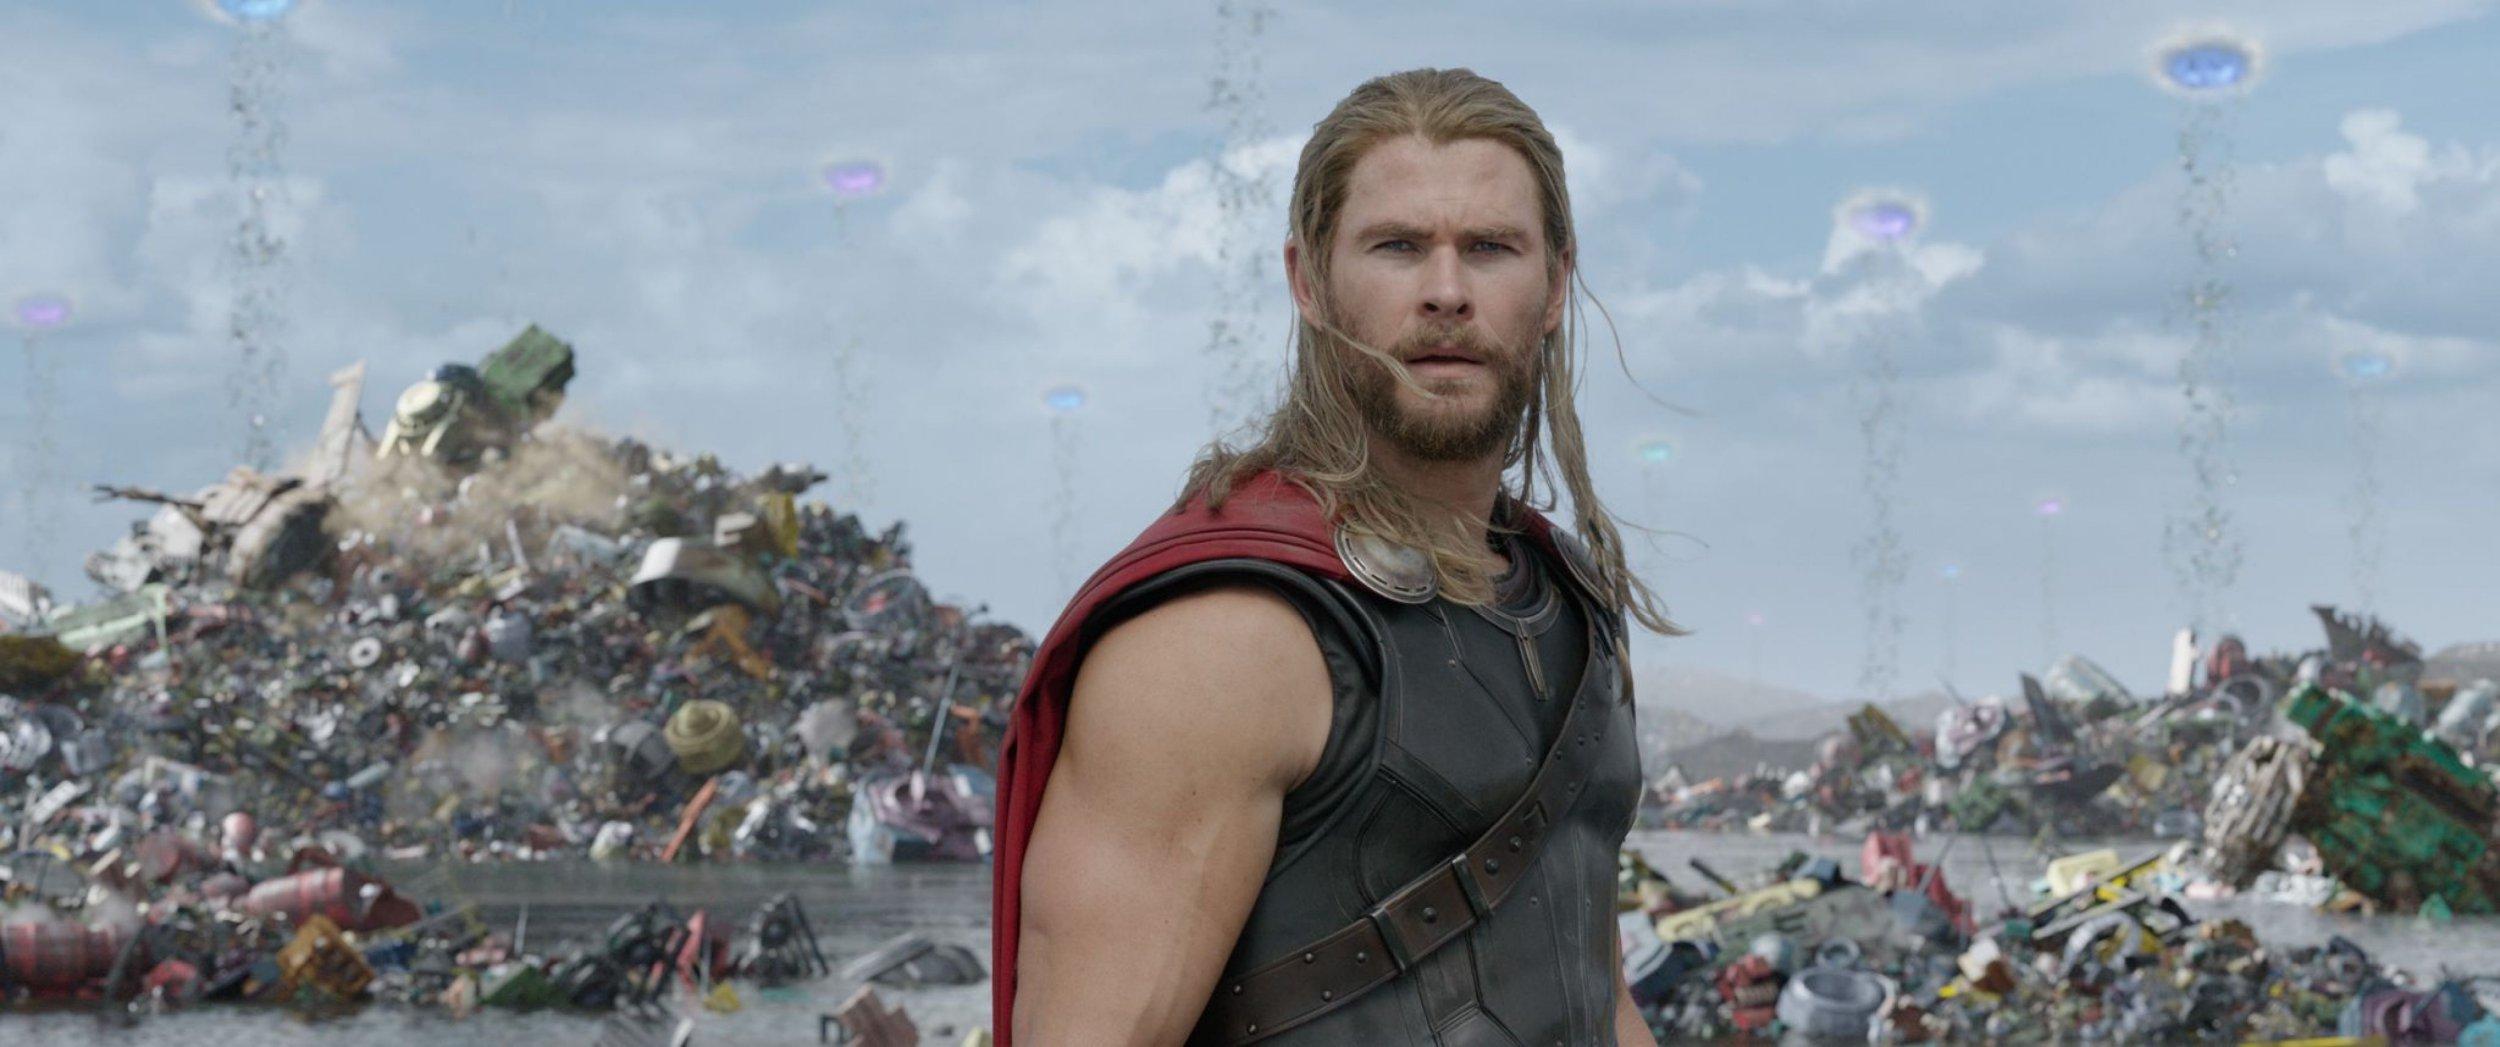 "Editorial use only. No book cover usage. Mandatory Credit: Photo by J Boland/Marvel Studios/Kobal/REX/Shutterstock (9220927g) Chris Hemsworth ""Thor: Ragnarok"" Film - 2017"